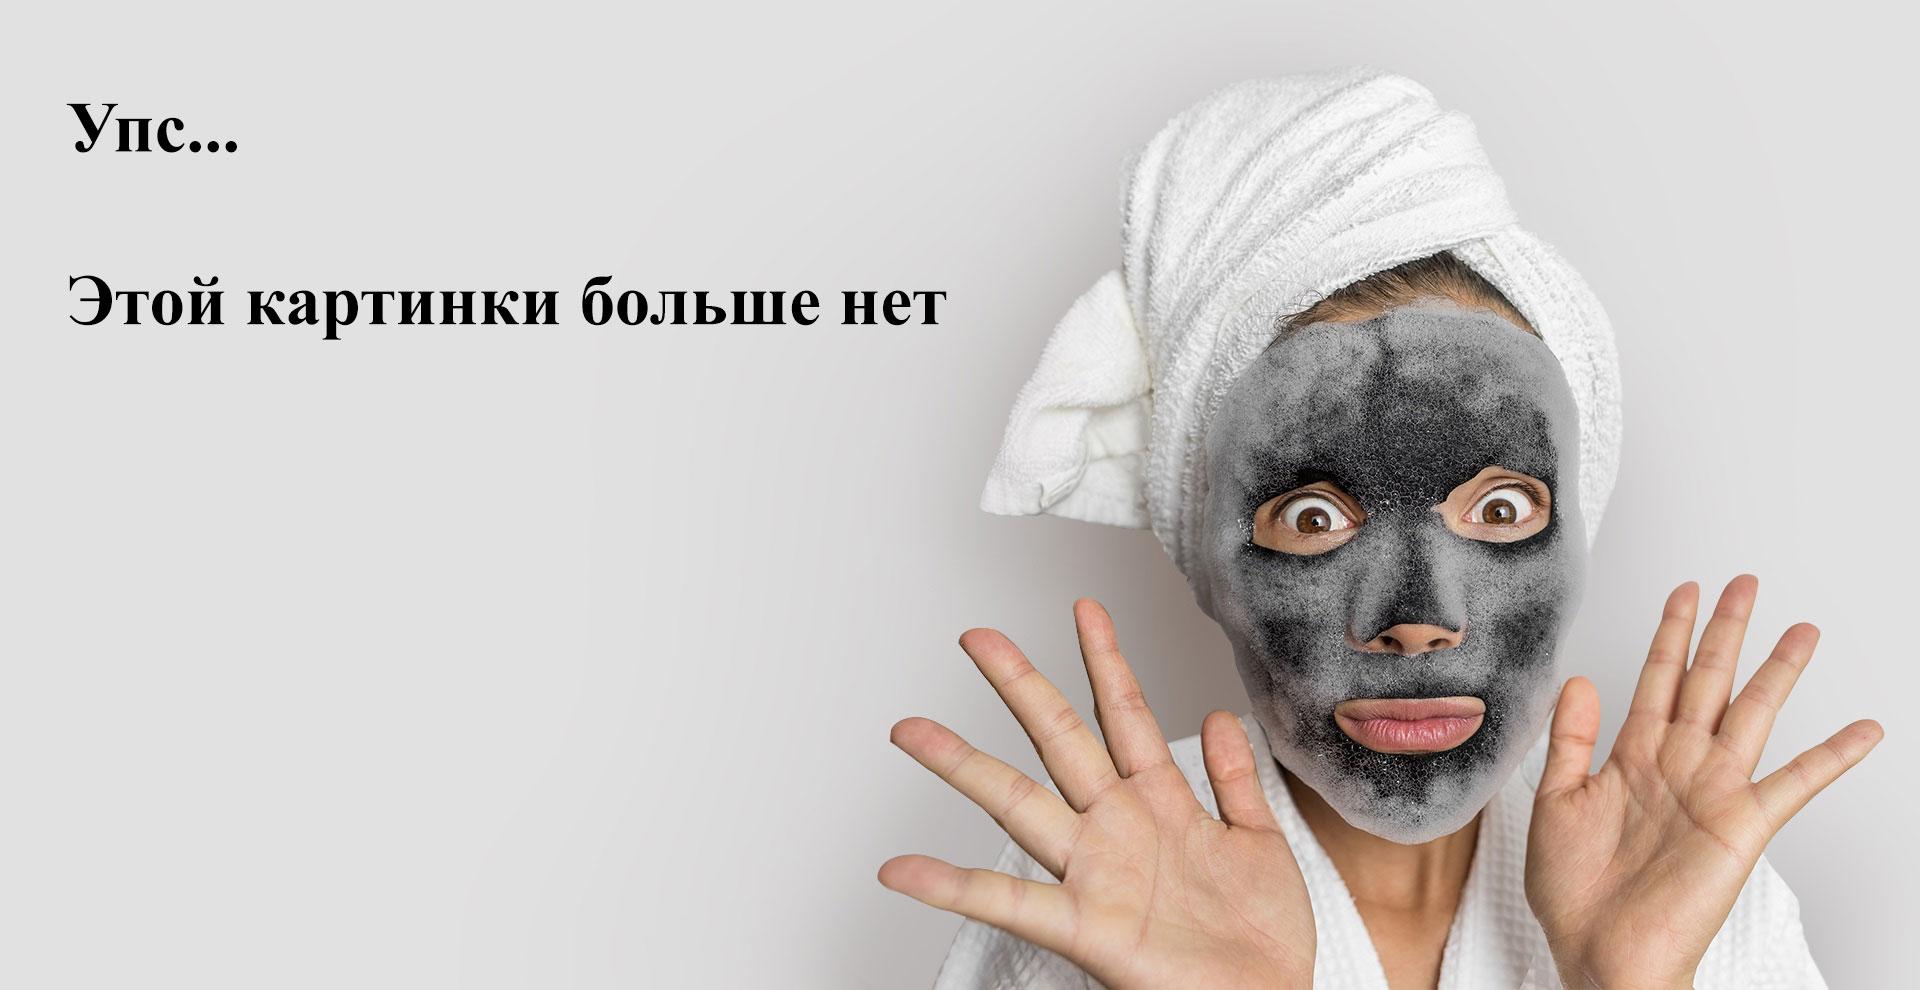 Biofollica, Сыворотка для лица Hyaluronic Acid, 30 мл (УЦЕНКА)